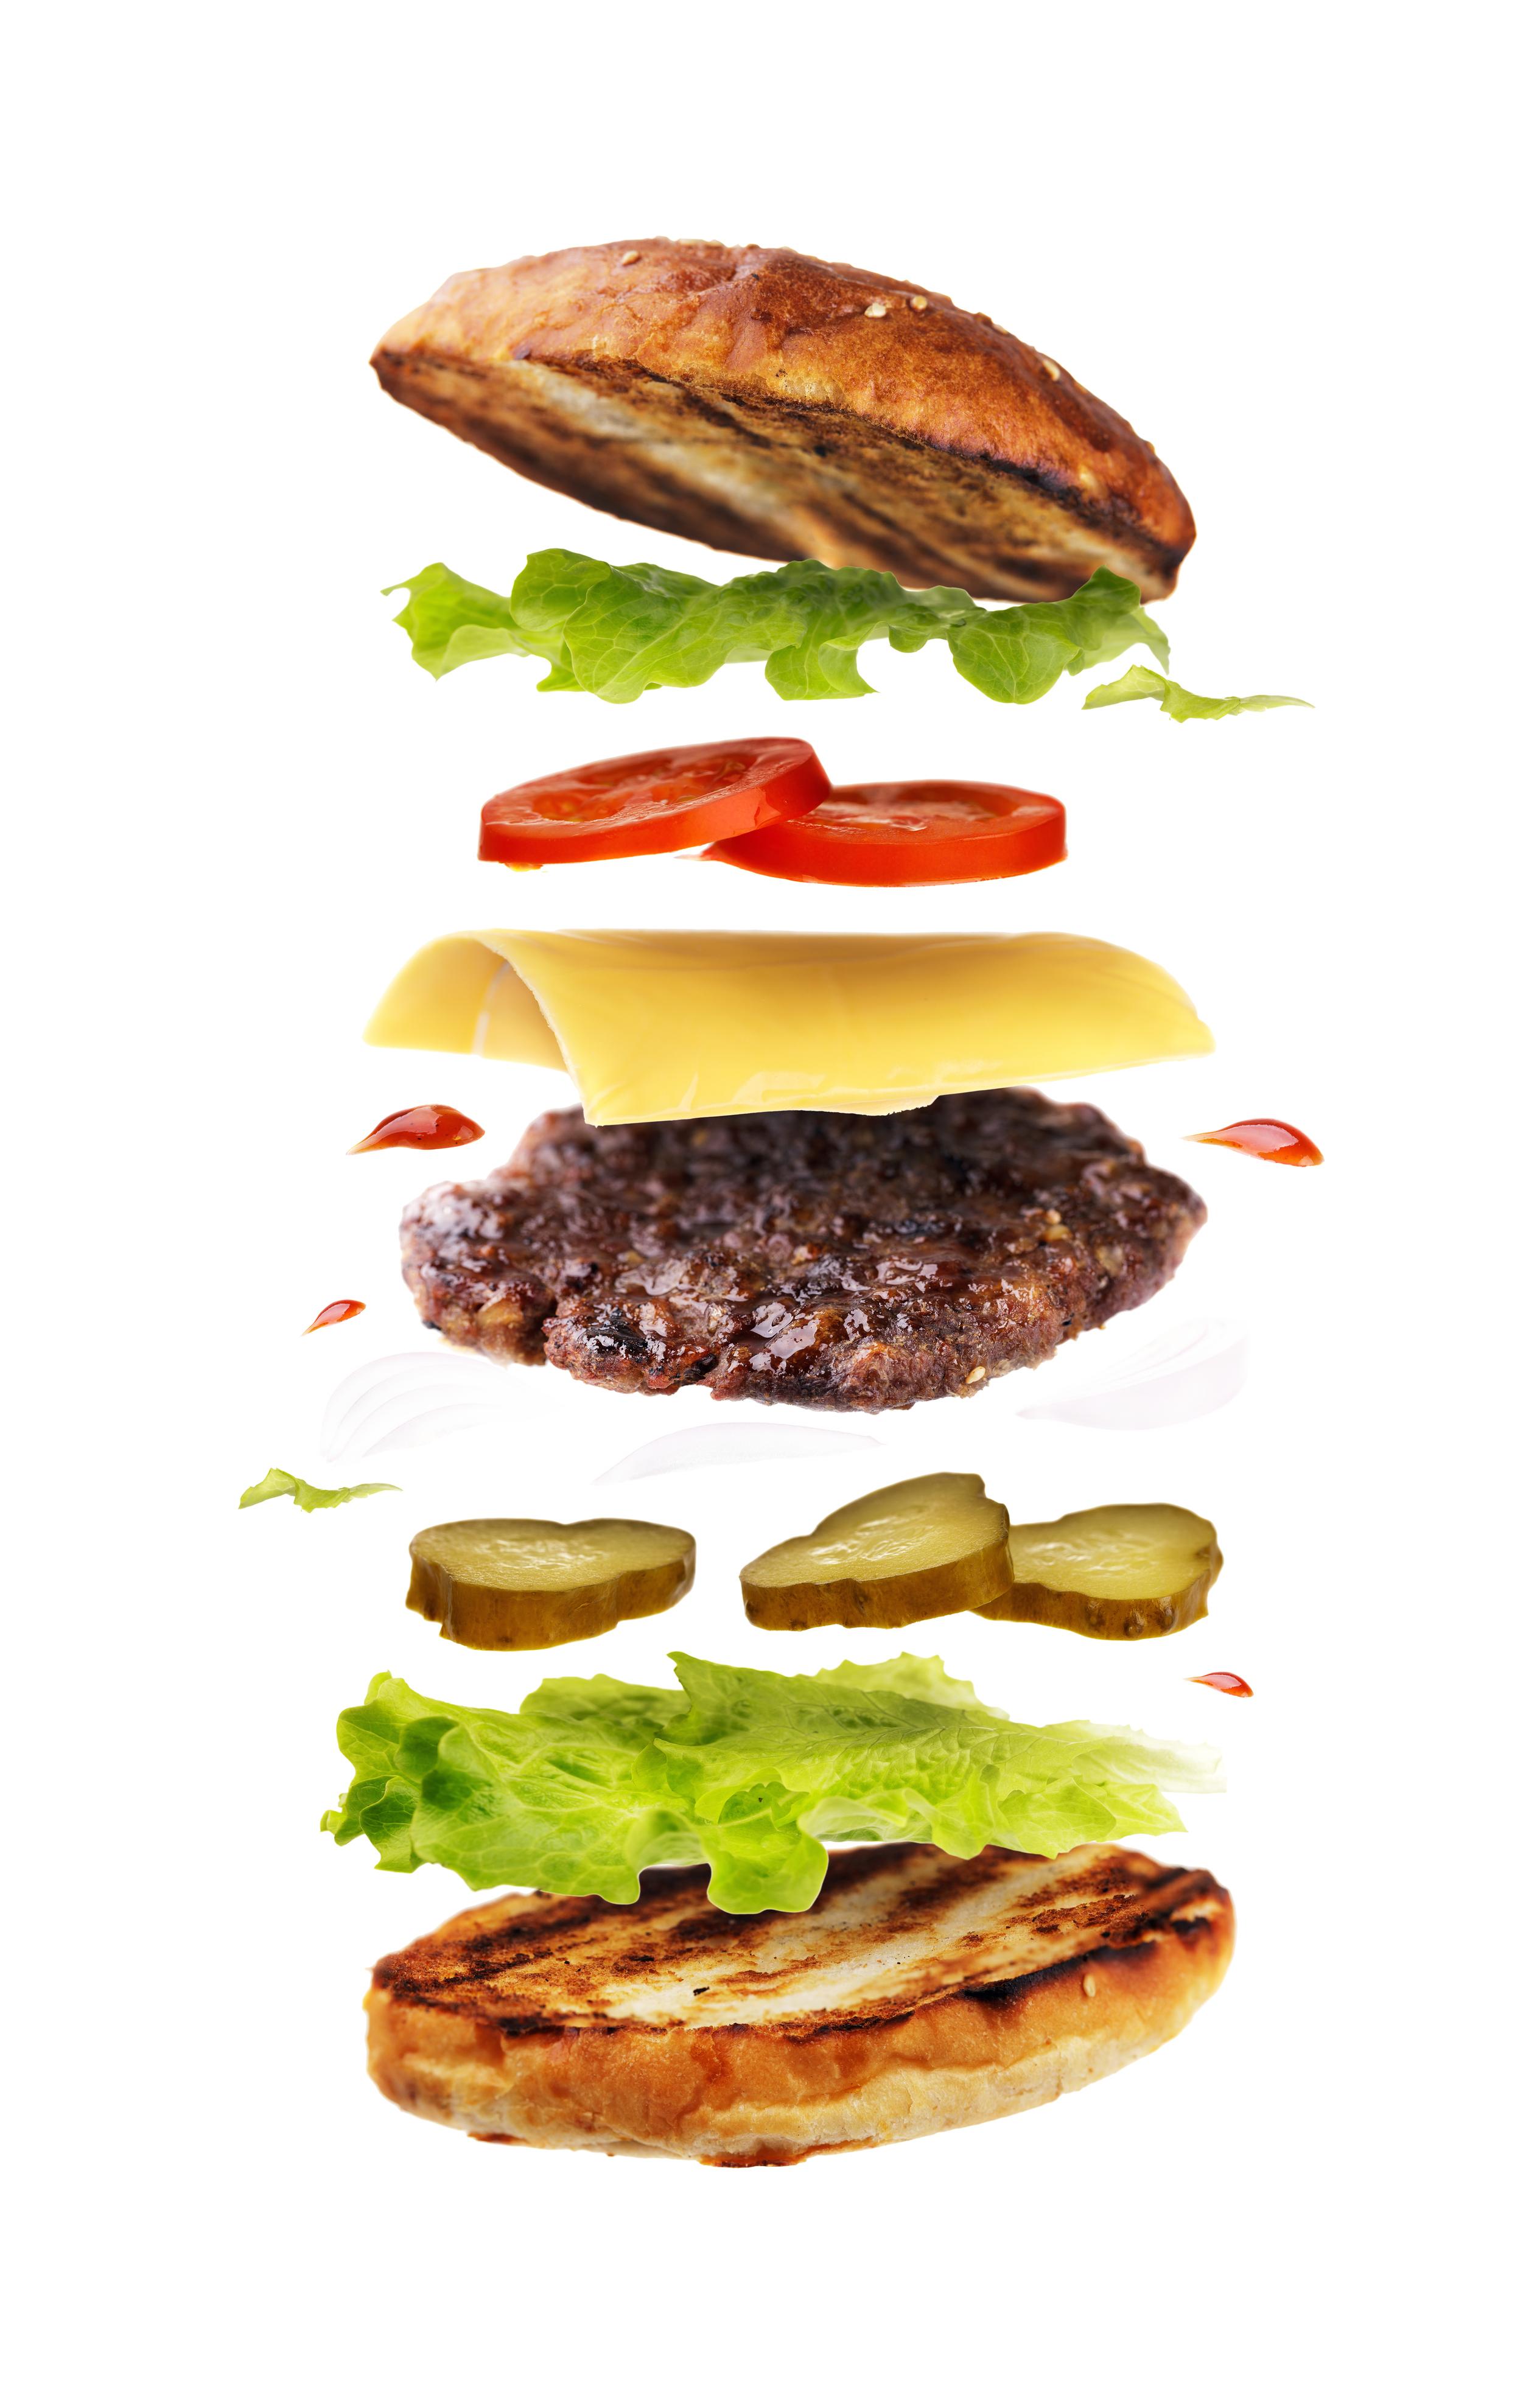 burgerStack